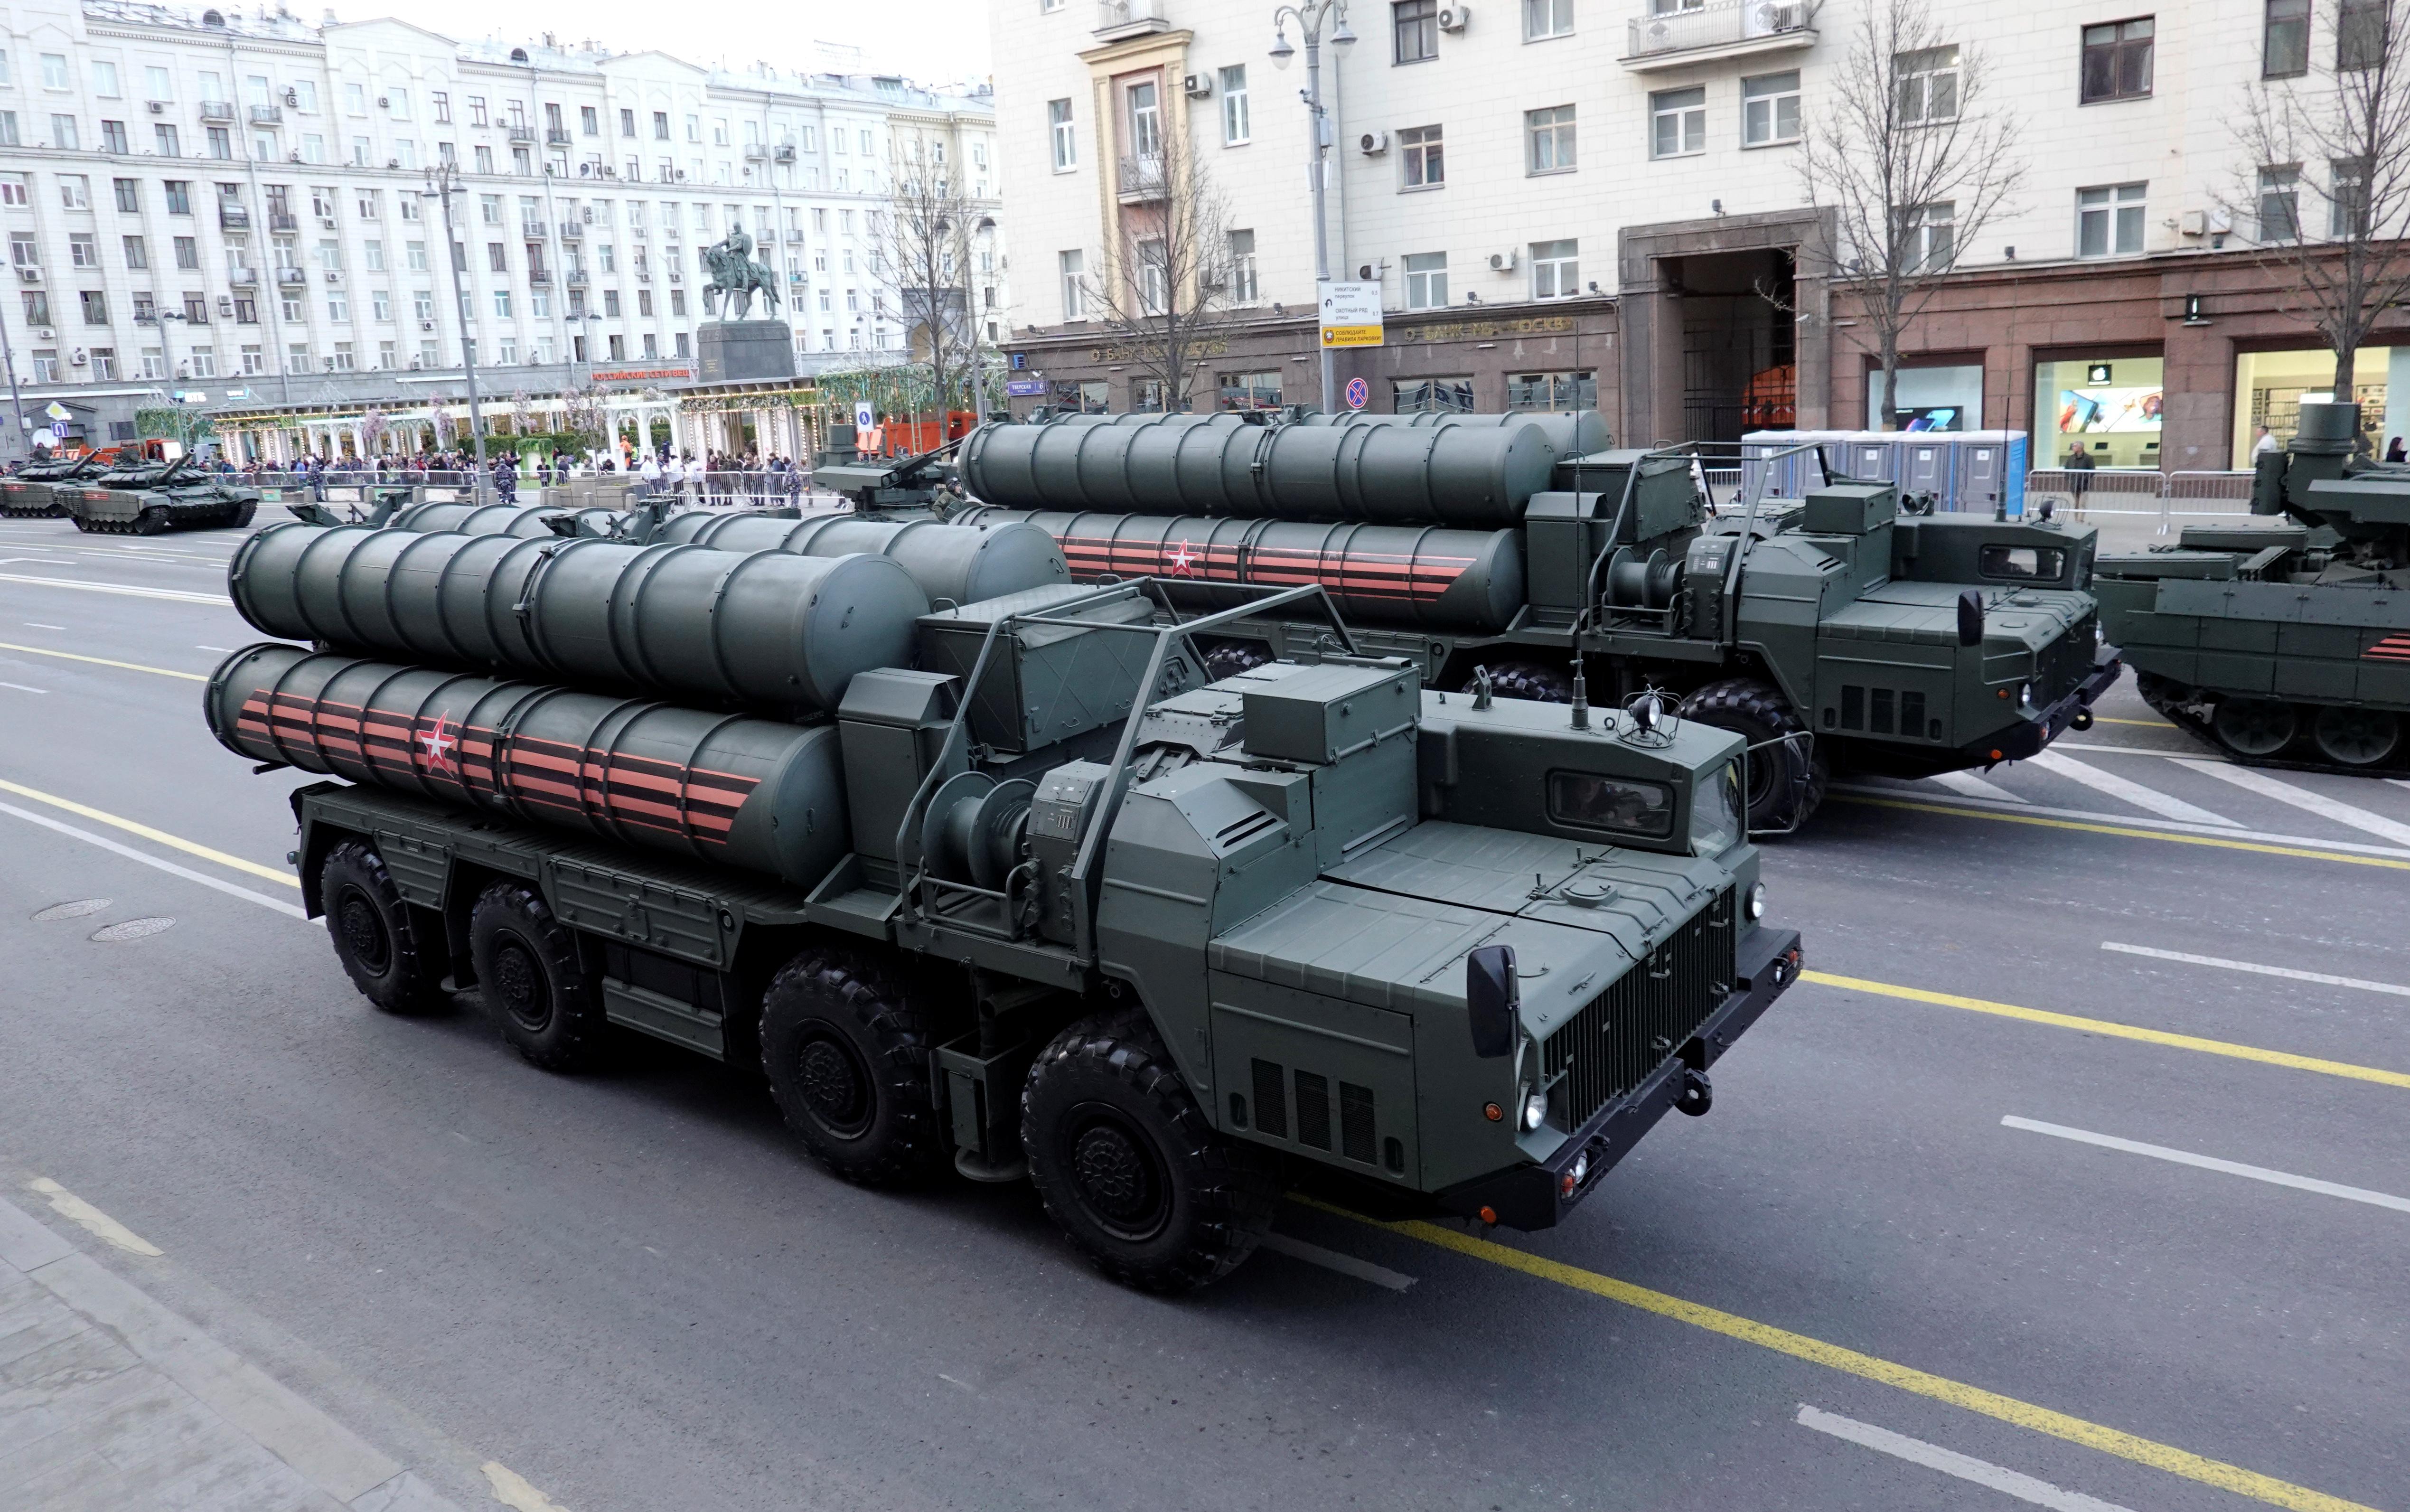 Kremlin condemns alleged U.S. ultimatum to Turkey over missile deal